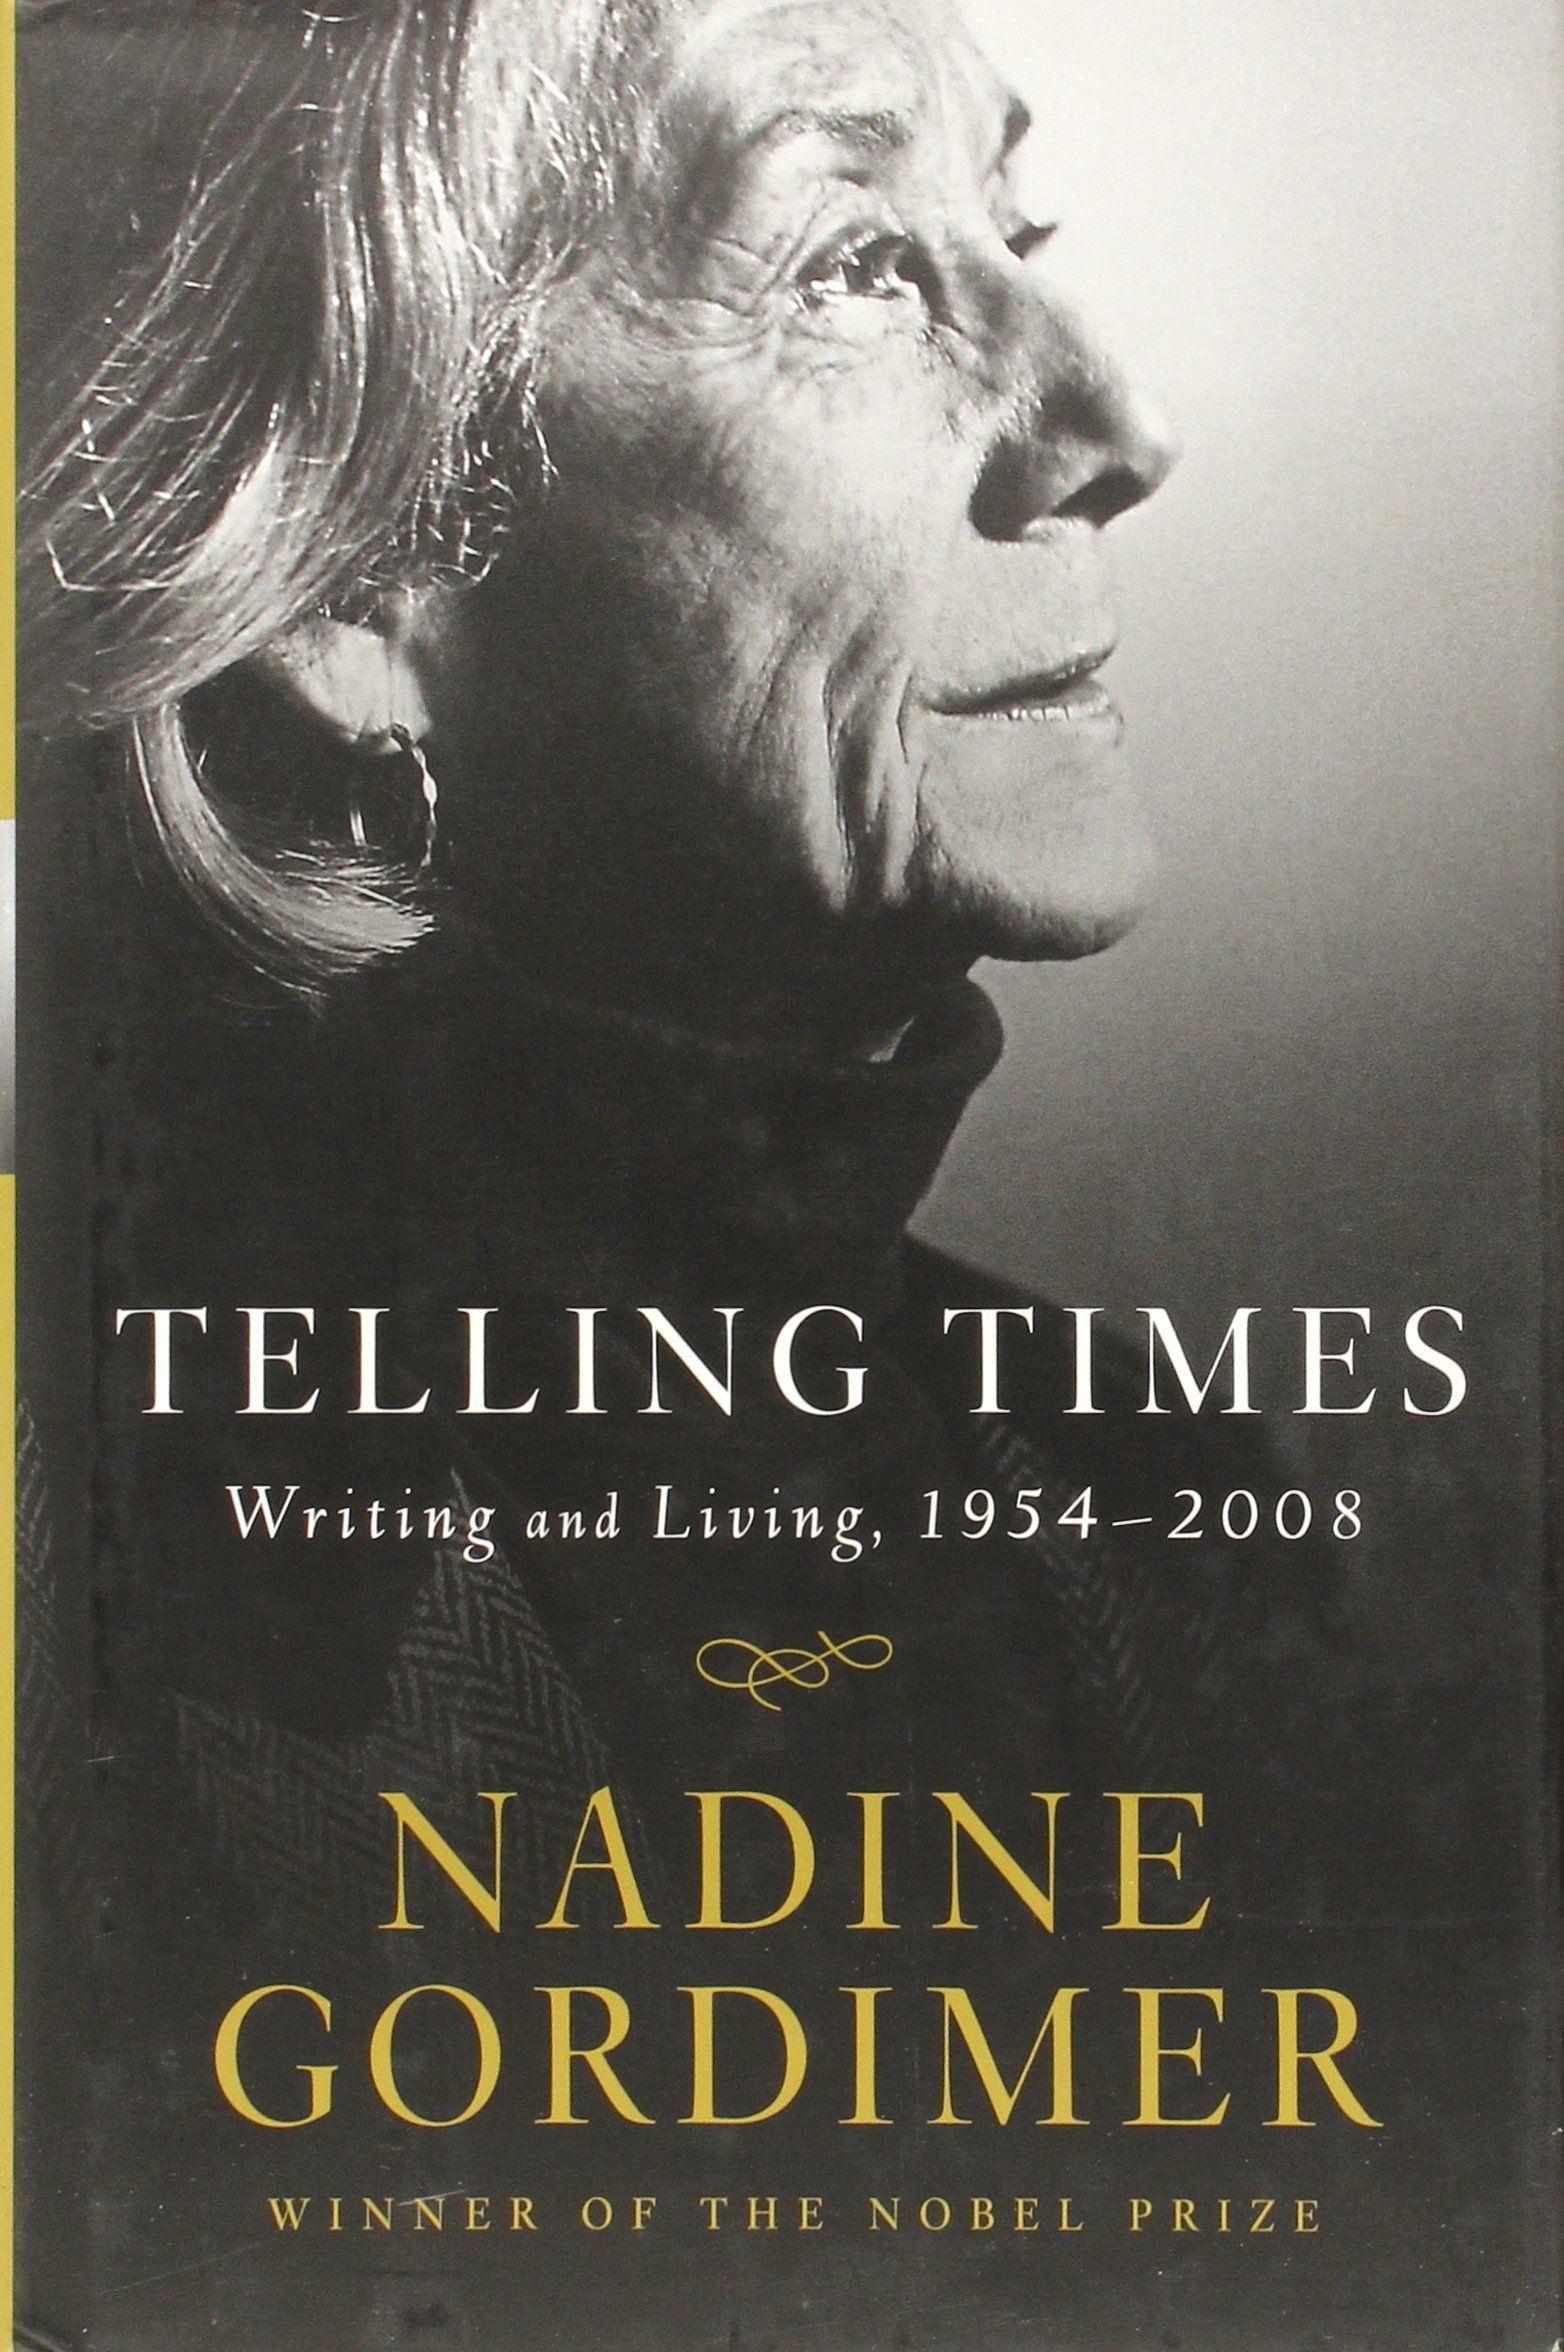 Telling Times: Writing and Living, 1954-2008: Nadine Gordimer: 9780393066289: Amazon.com: Books